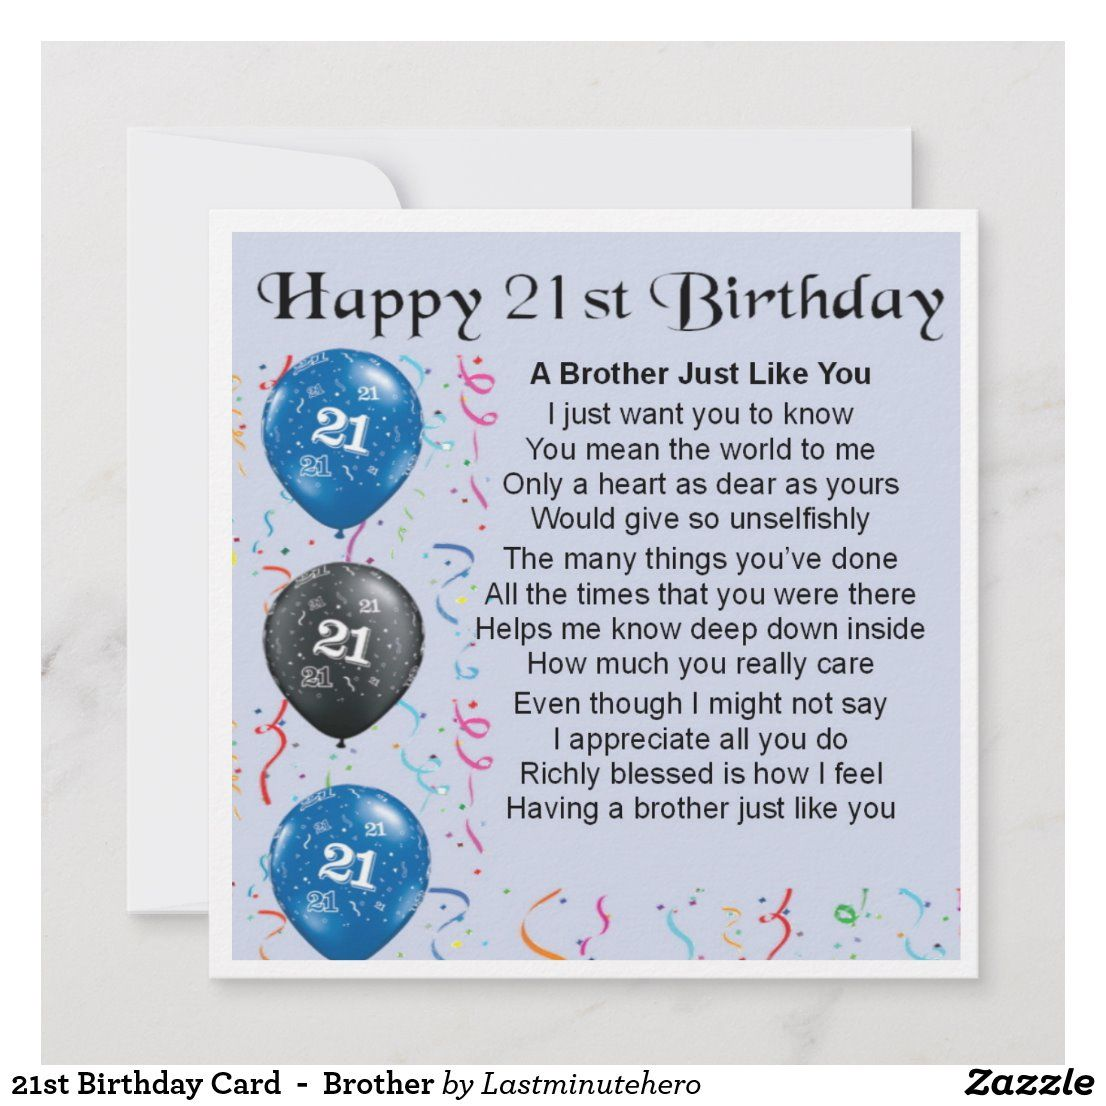 21st Birthday Card Brother Zazzle.co.uk 21st